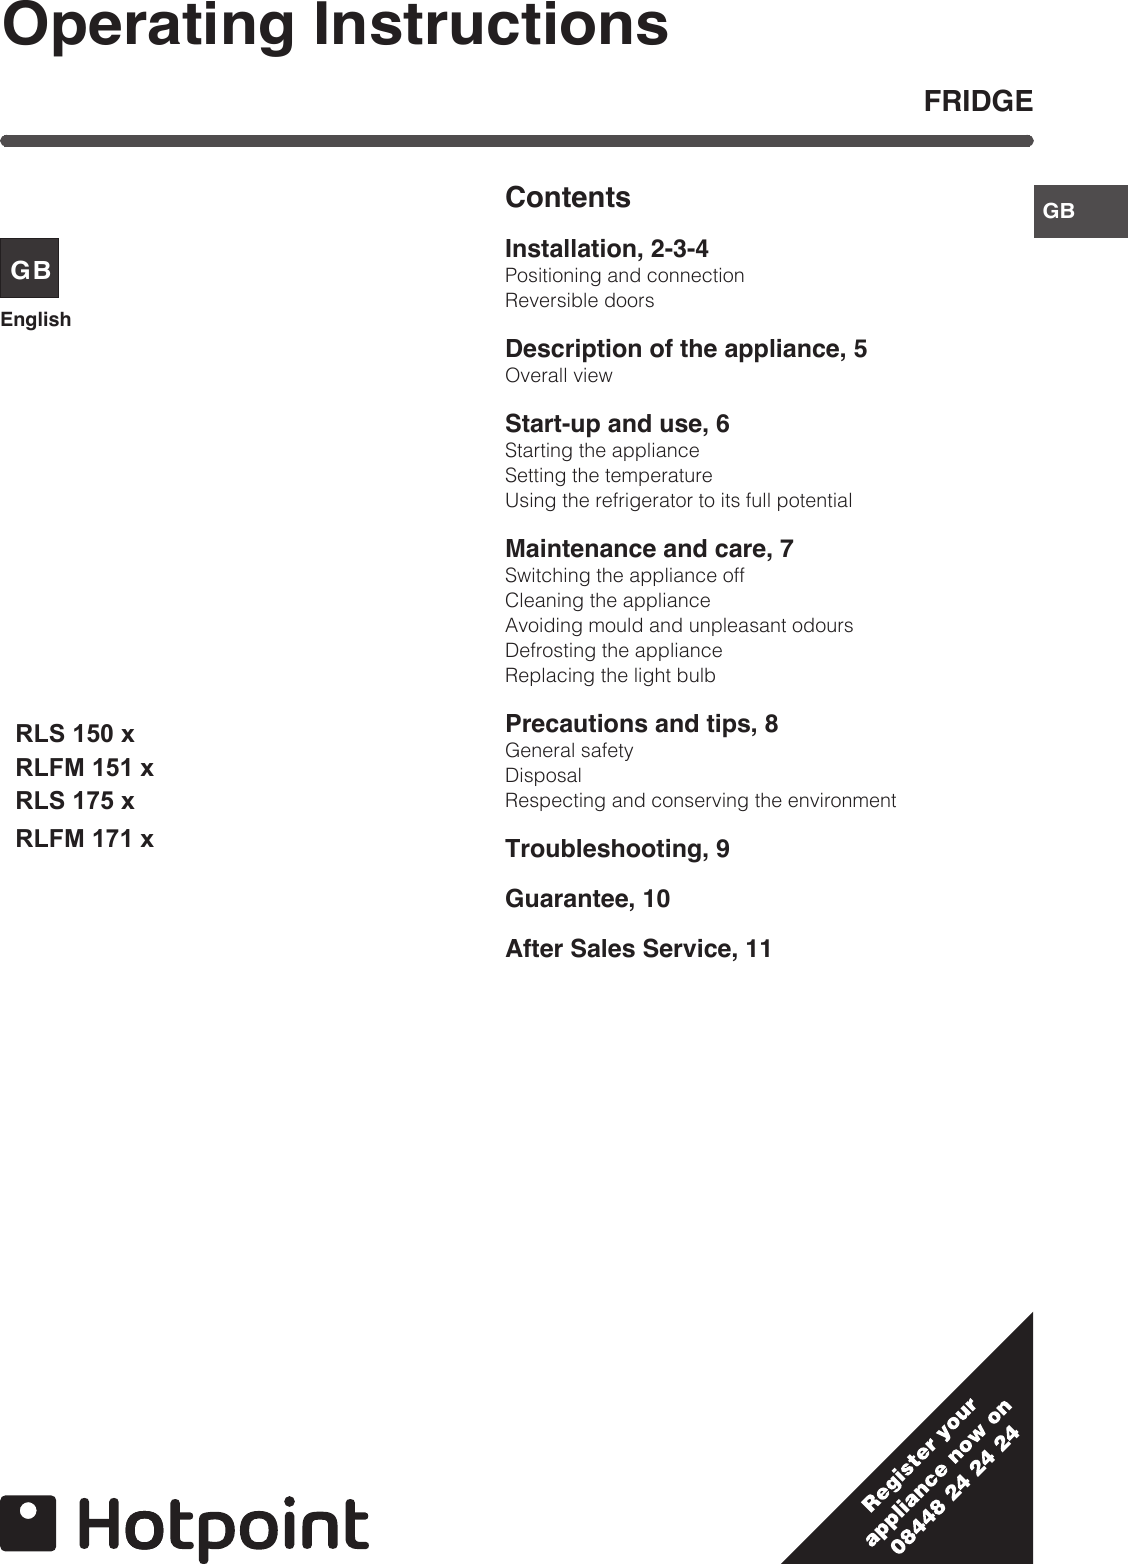 Hotpoint Disposal Wiring Diagram Ice Maker Stove Refrigerator Rls 175 X 150 Rlfm 151 171 Users Manual On